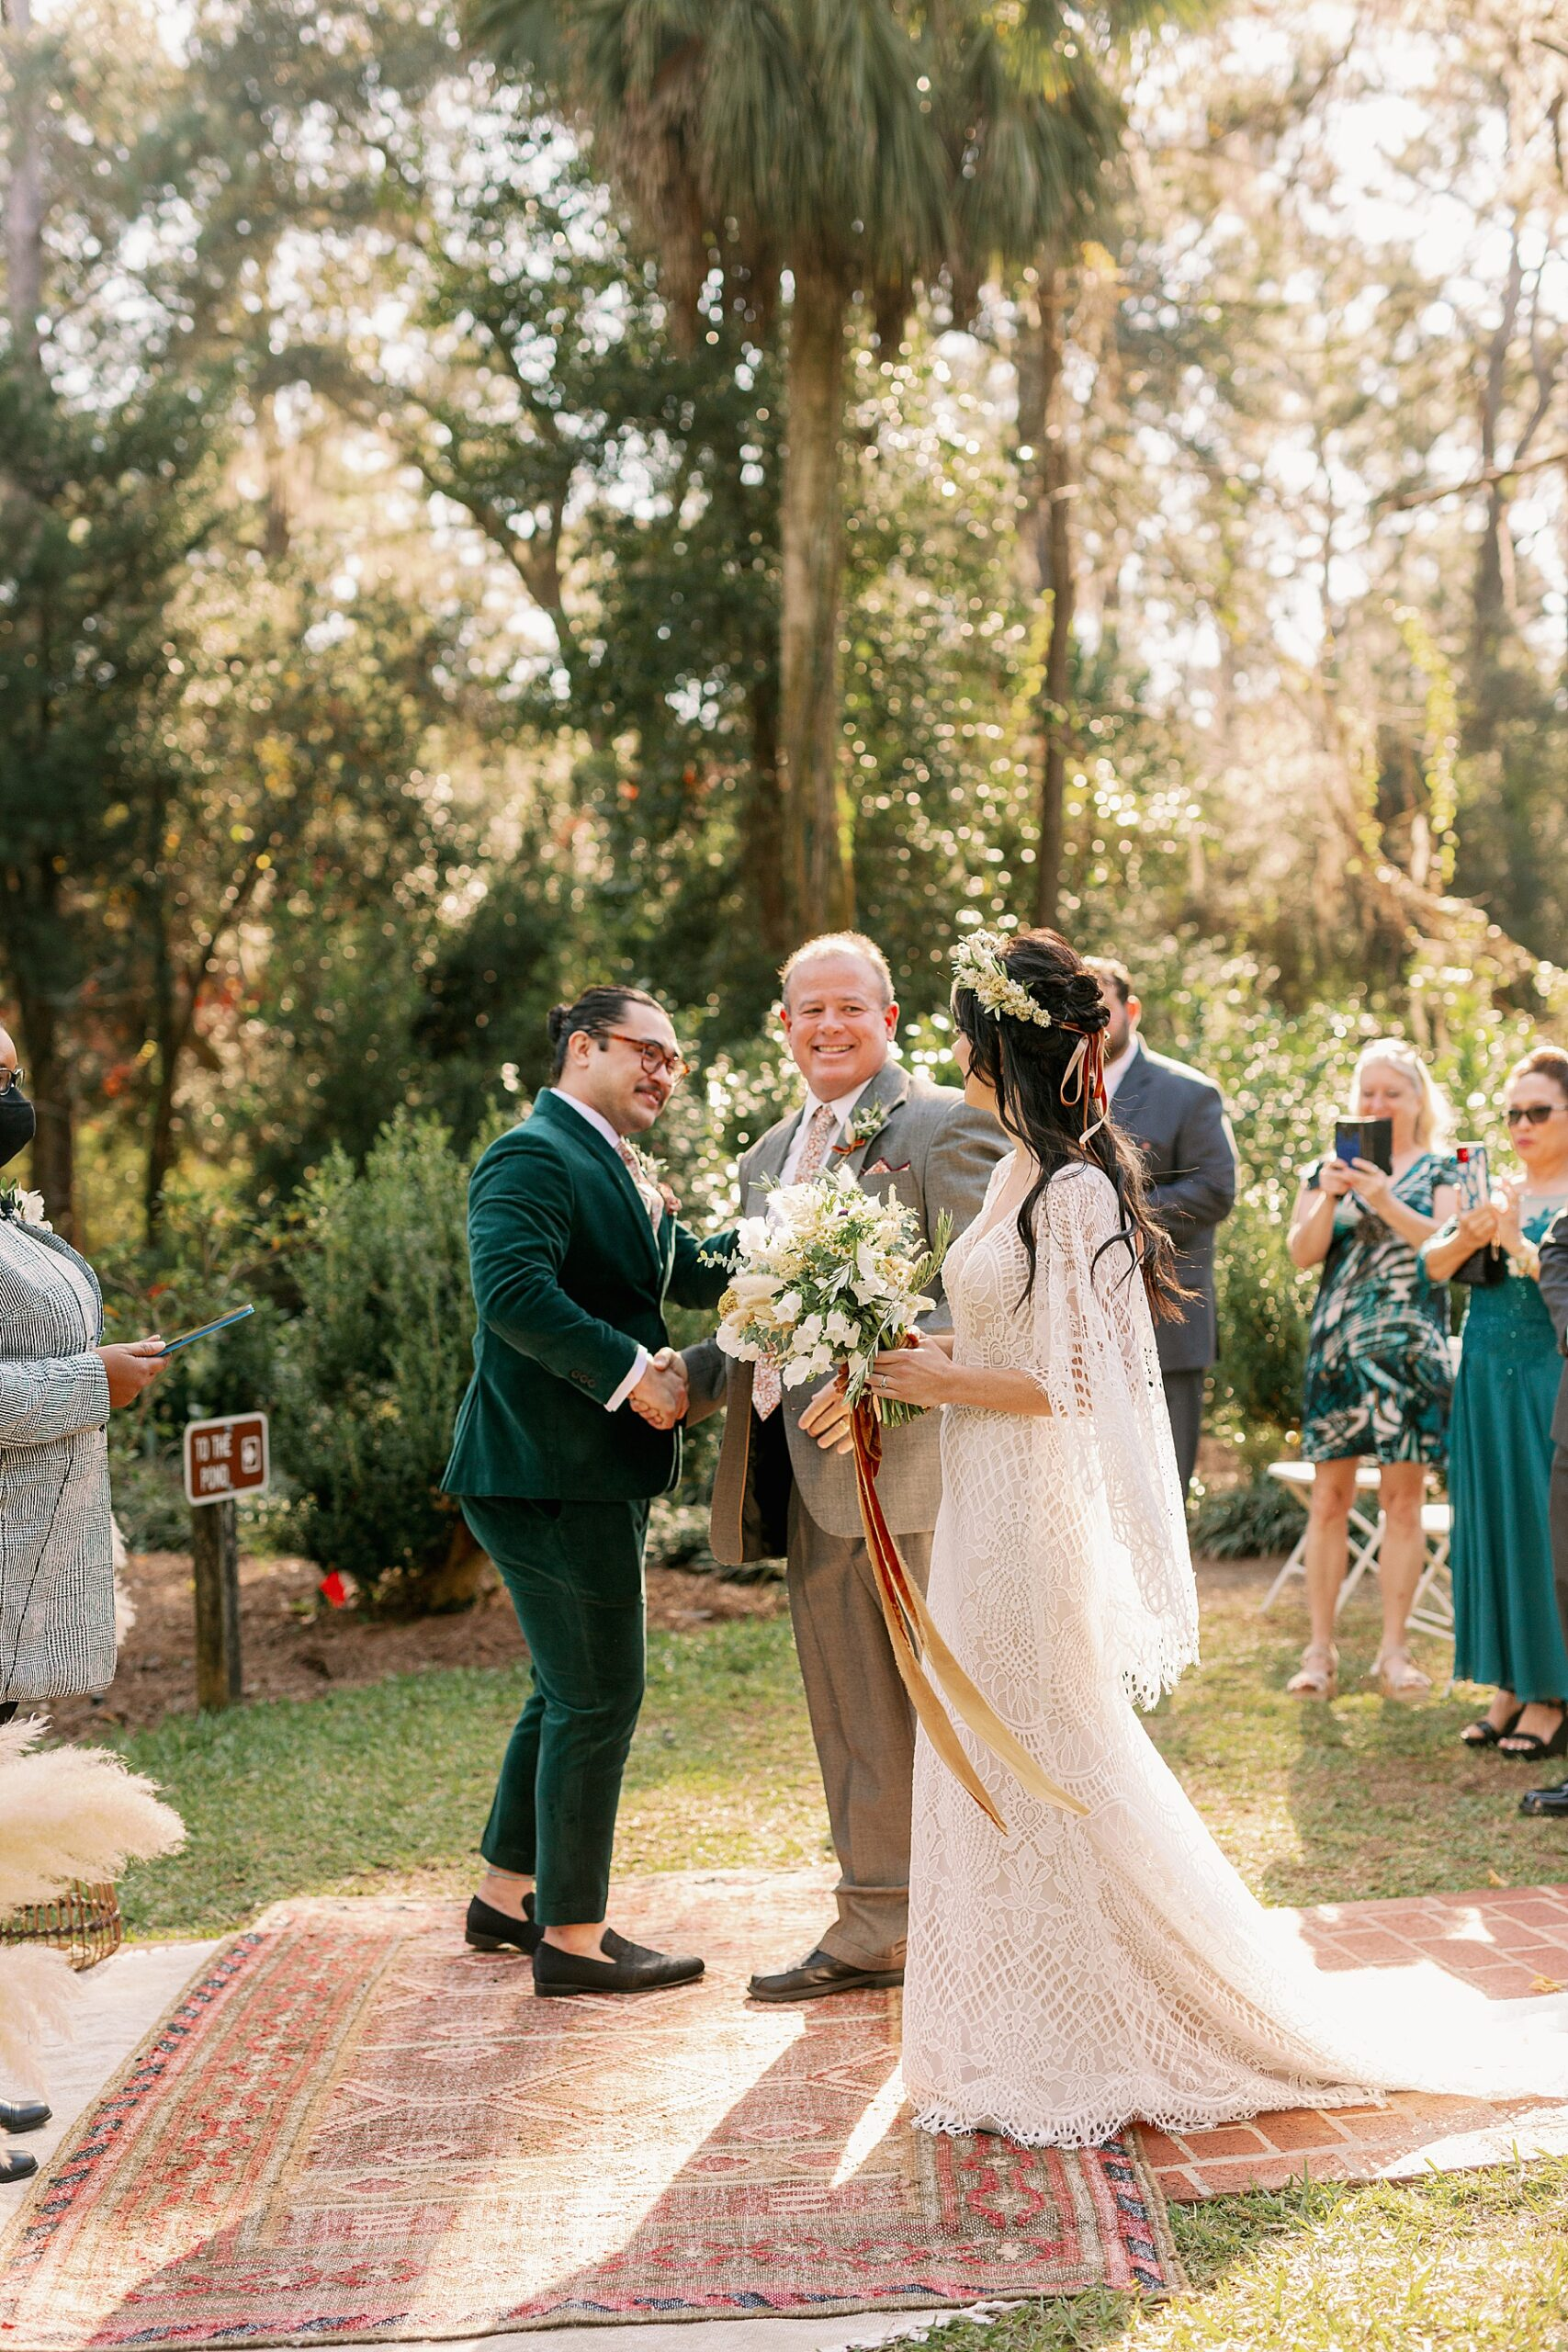 Groom and Bride's dad shake hands at wedding ceremony